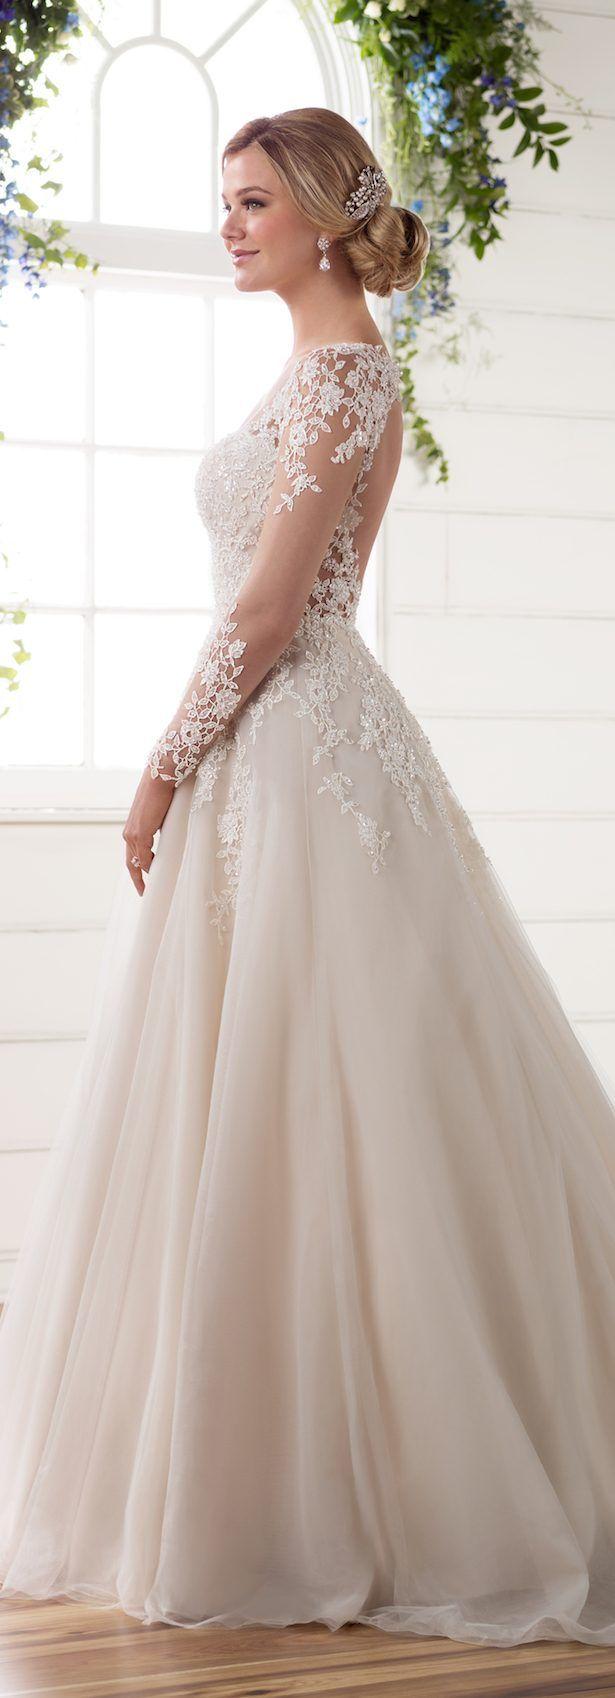 Essense wedding dress  Essense of Australia Spring  Bridal Collection  Pinterest